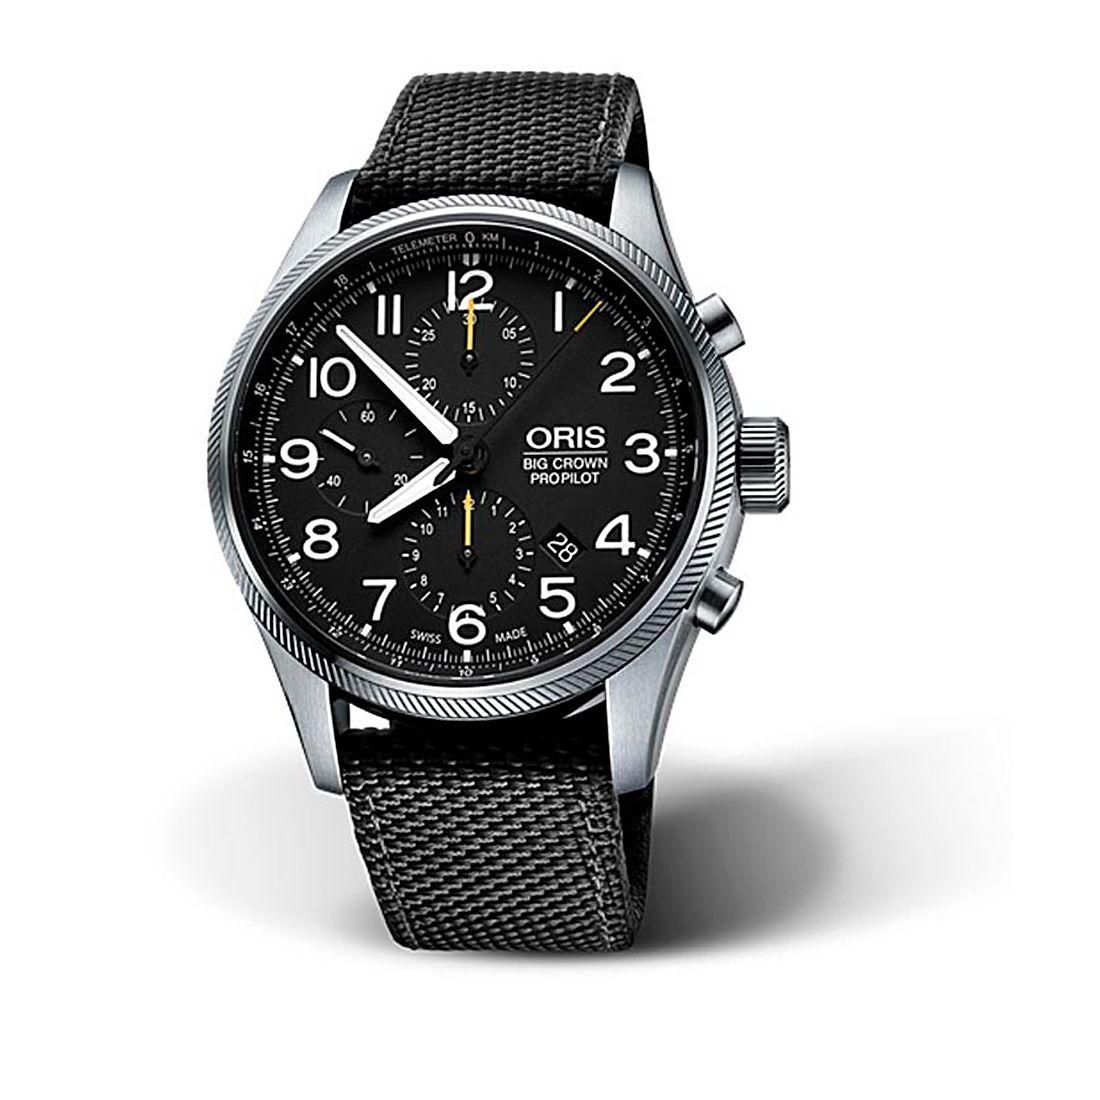 Reloj Oris Big Crown Propilot Chronograph - 01 774 7699 4134-07 5 22 15  - 1